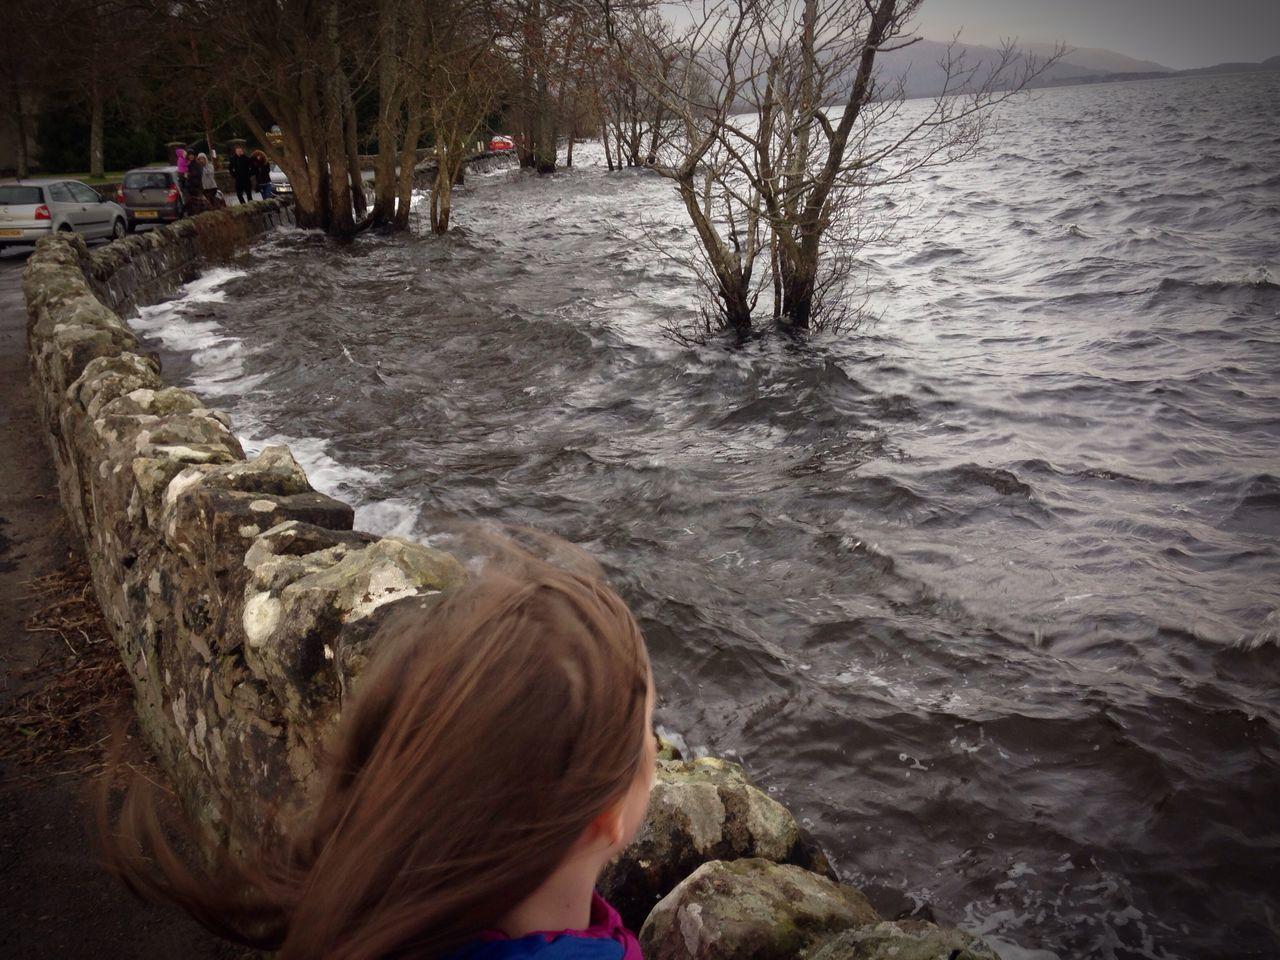 LochLomond Loch Lomond Water Tranquility Day Tranquil Scene Outdoors Solitude Looking Scenics